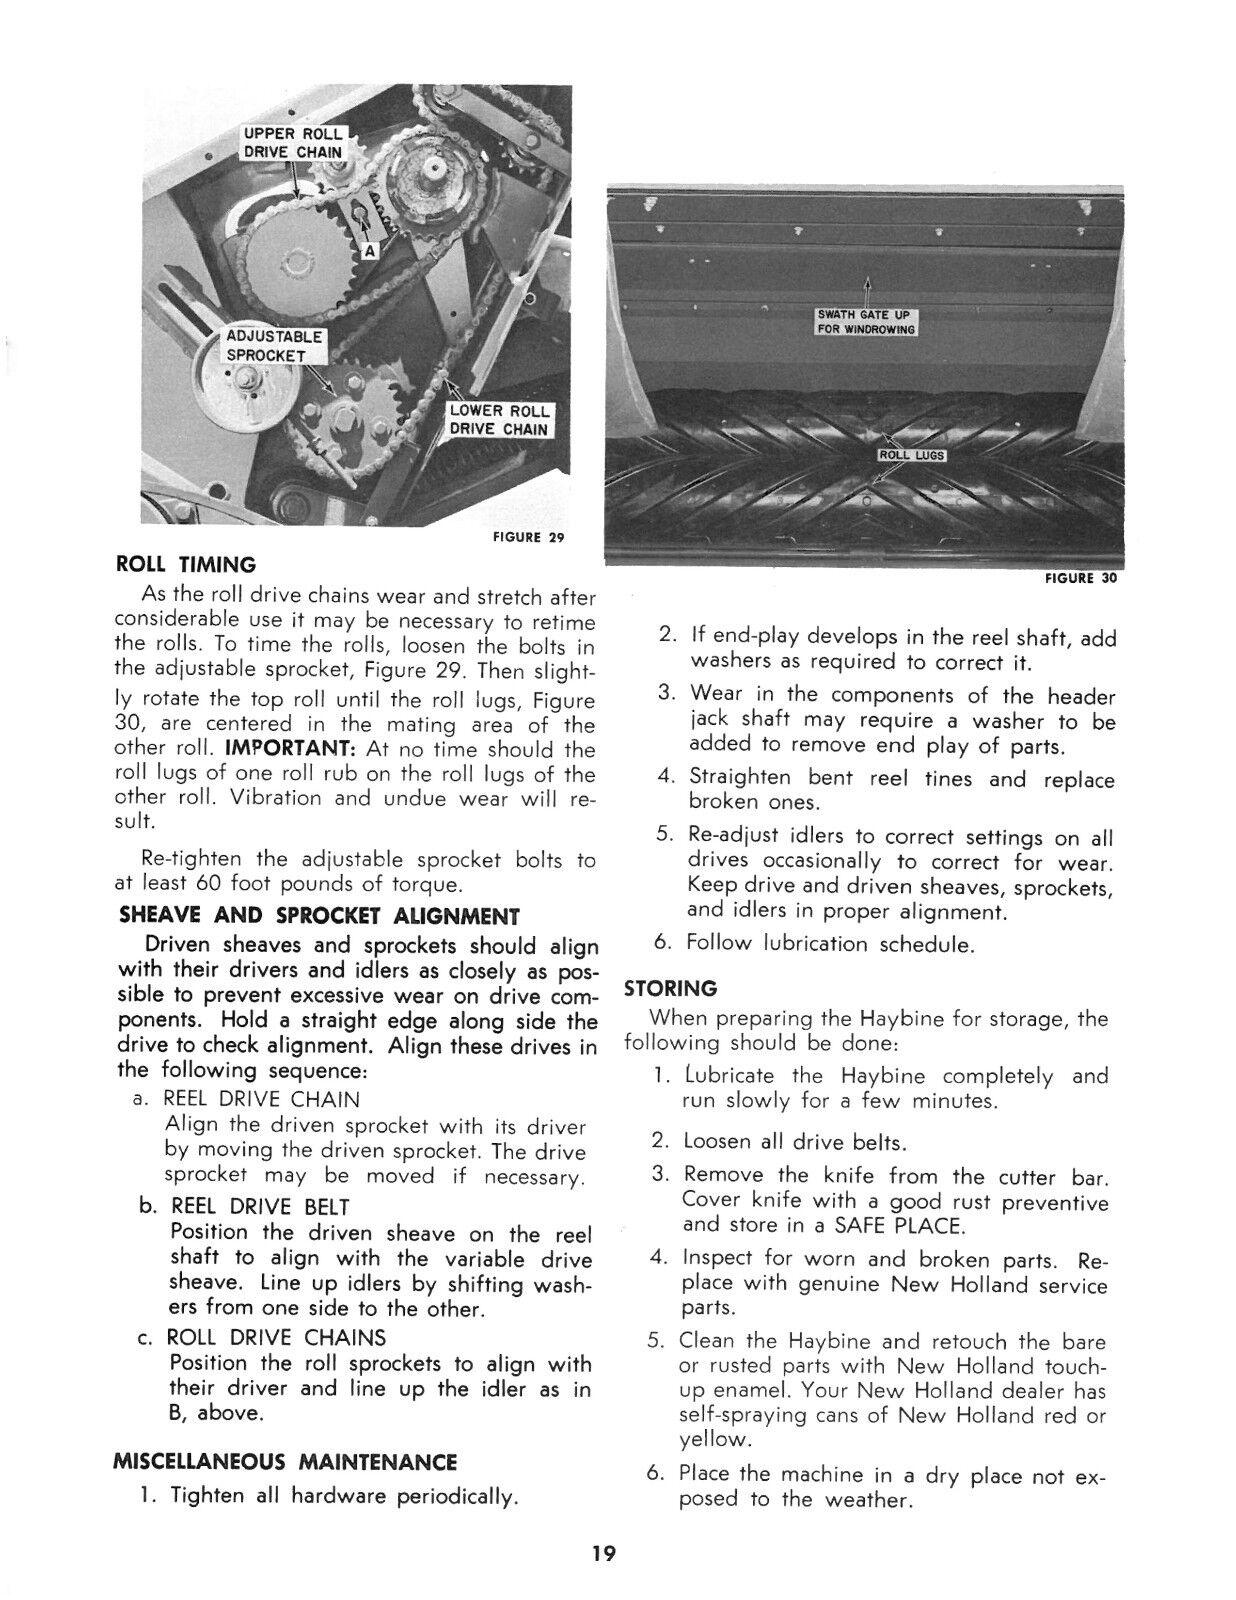 New Holland 469 Haybine Mower Conditioner Operator's AND